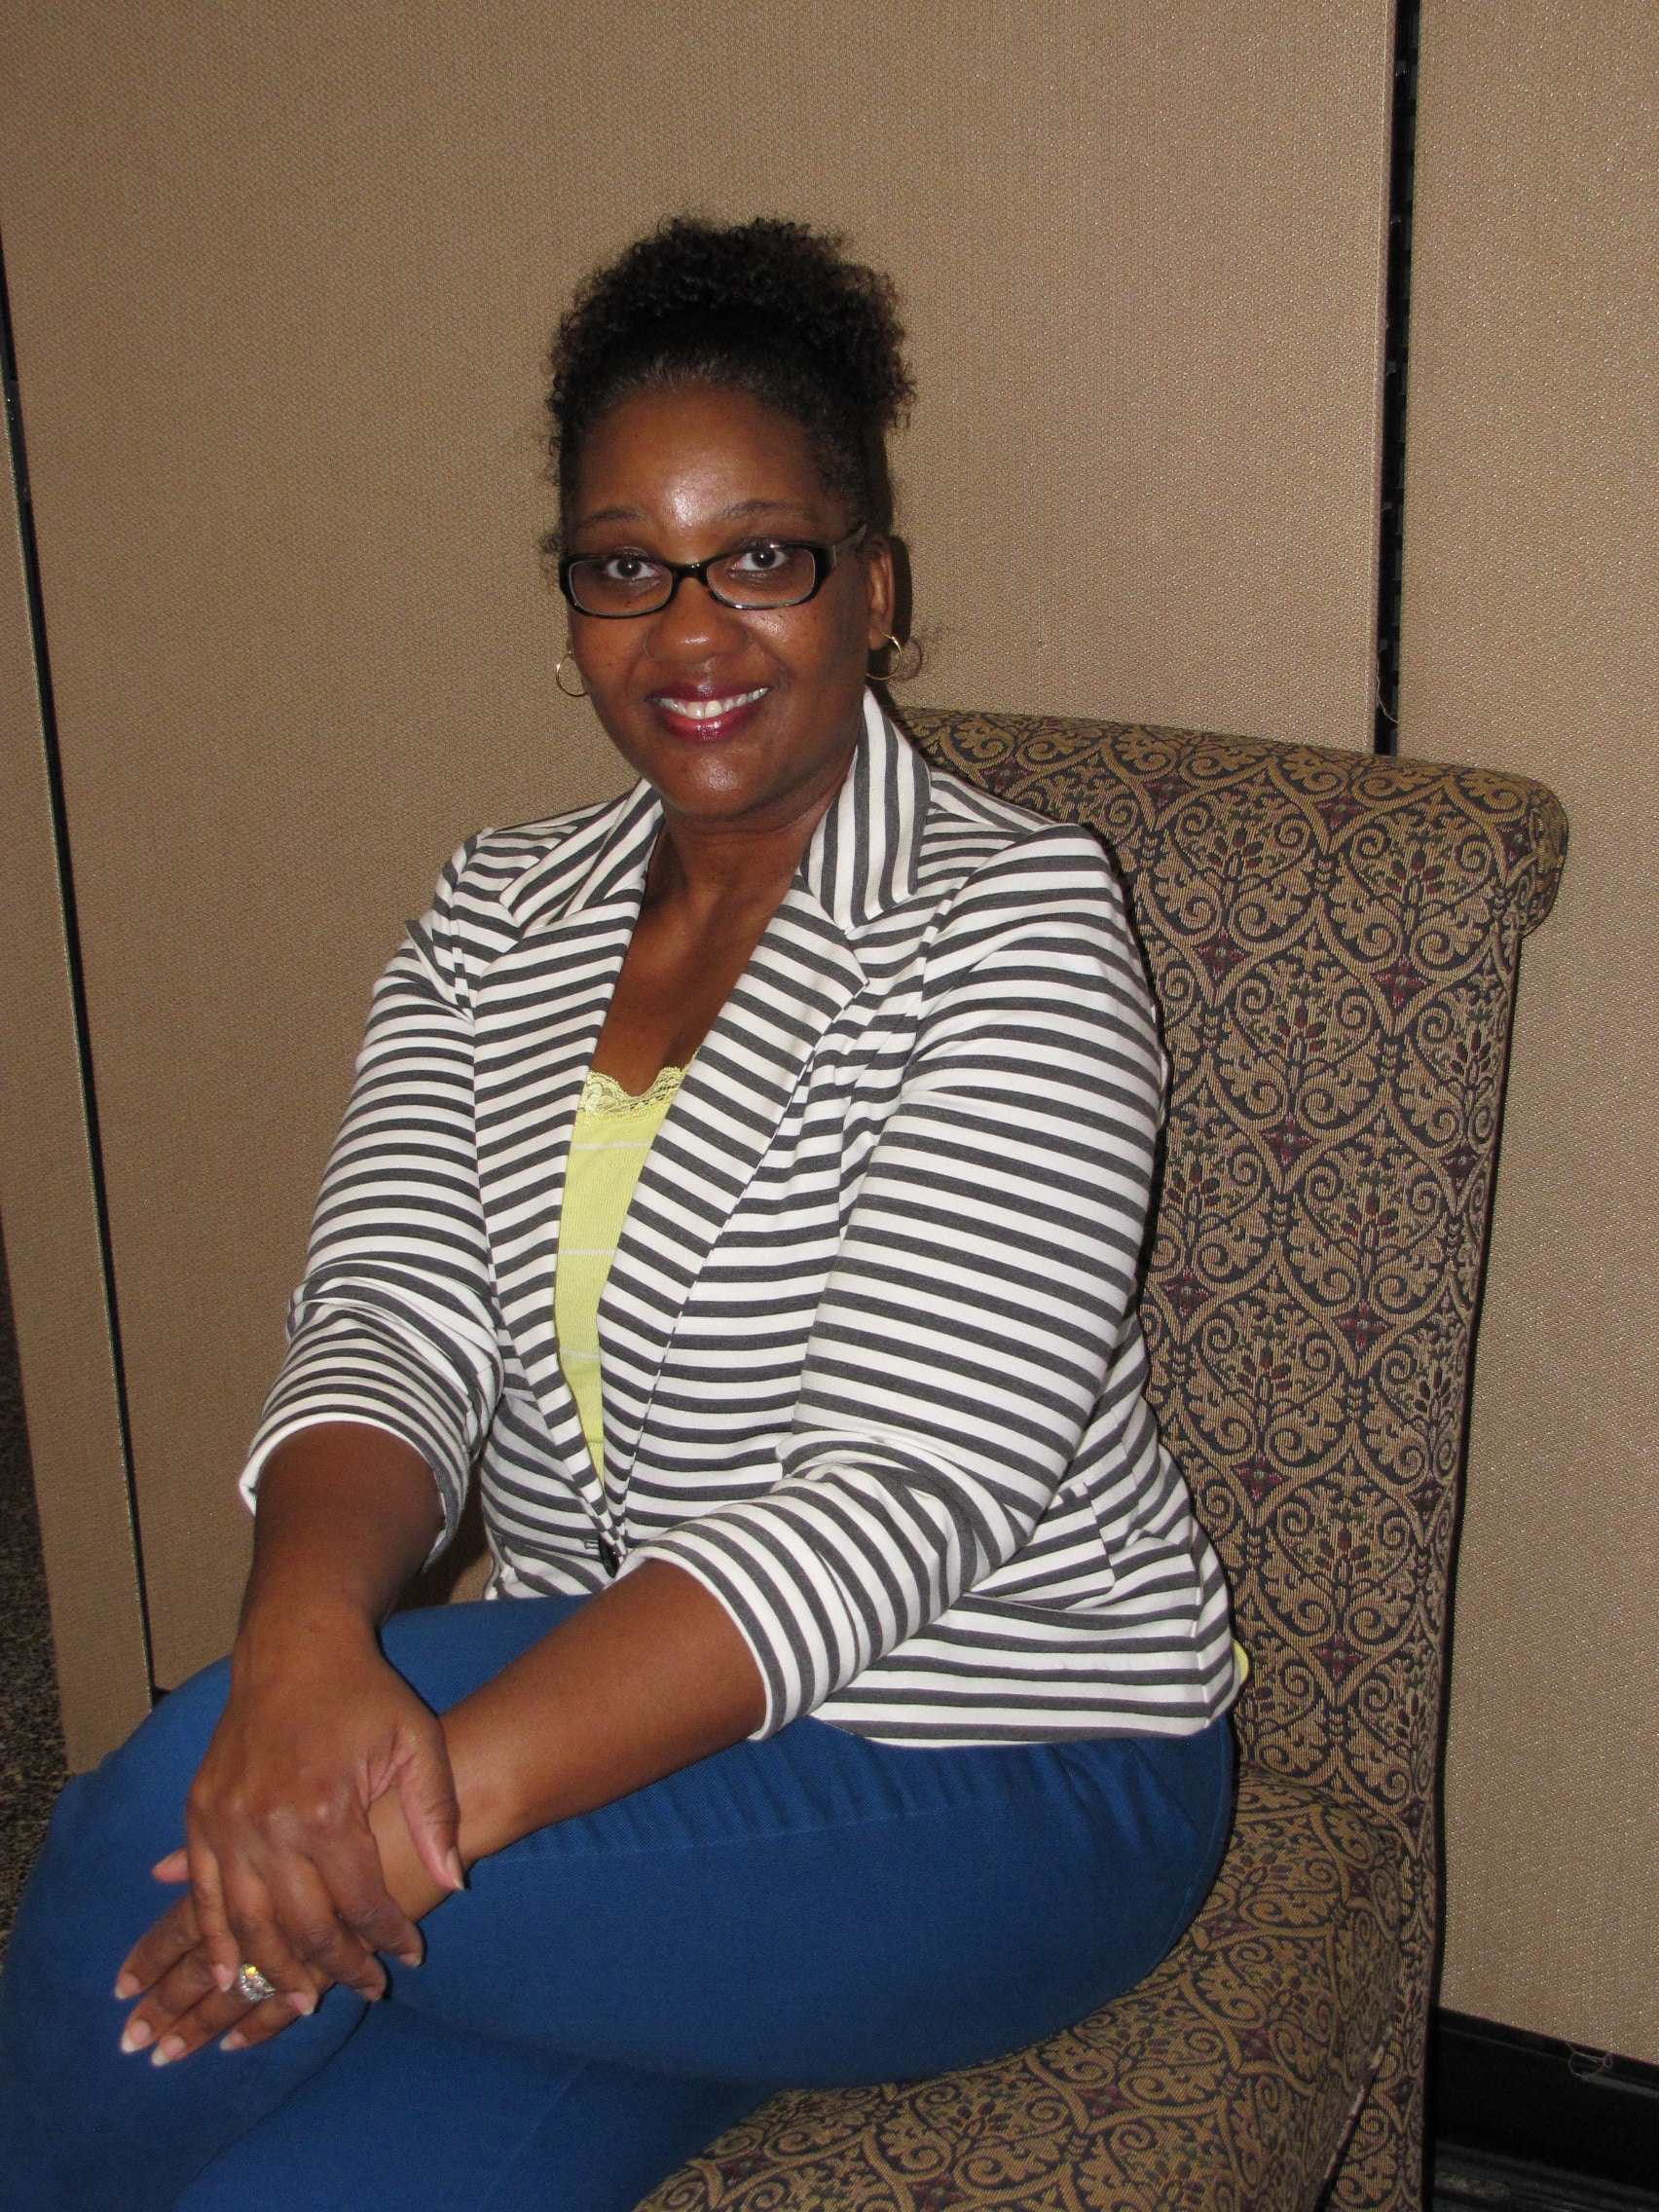 STUDENT SPOTLIGHT: Claudette Fuller, Graduate School